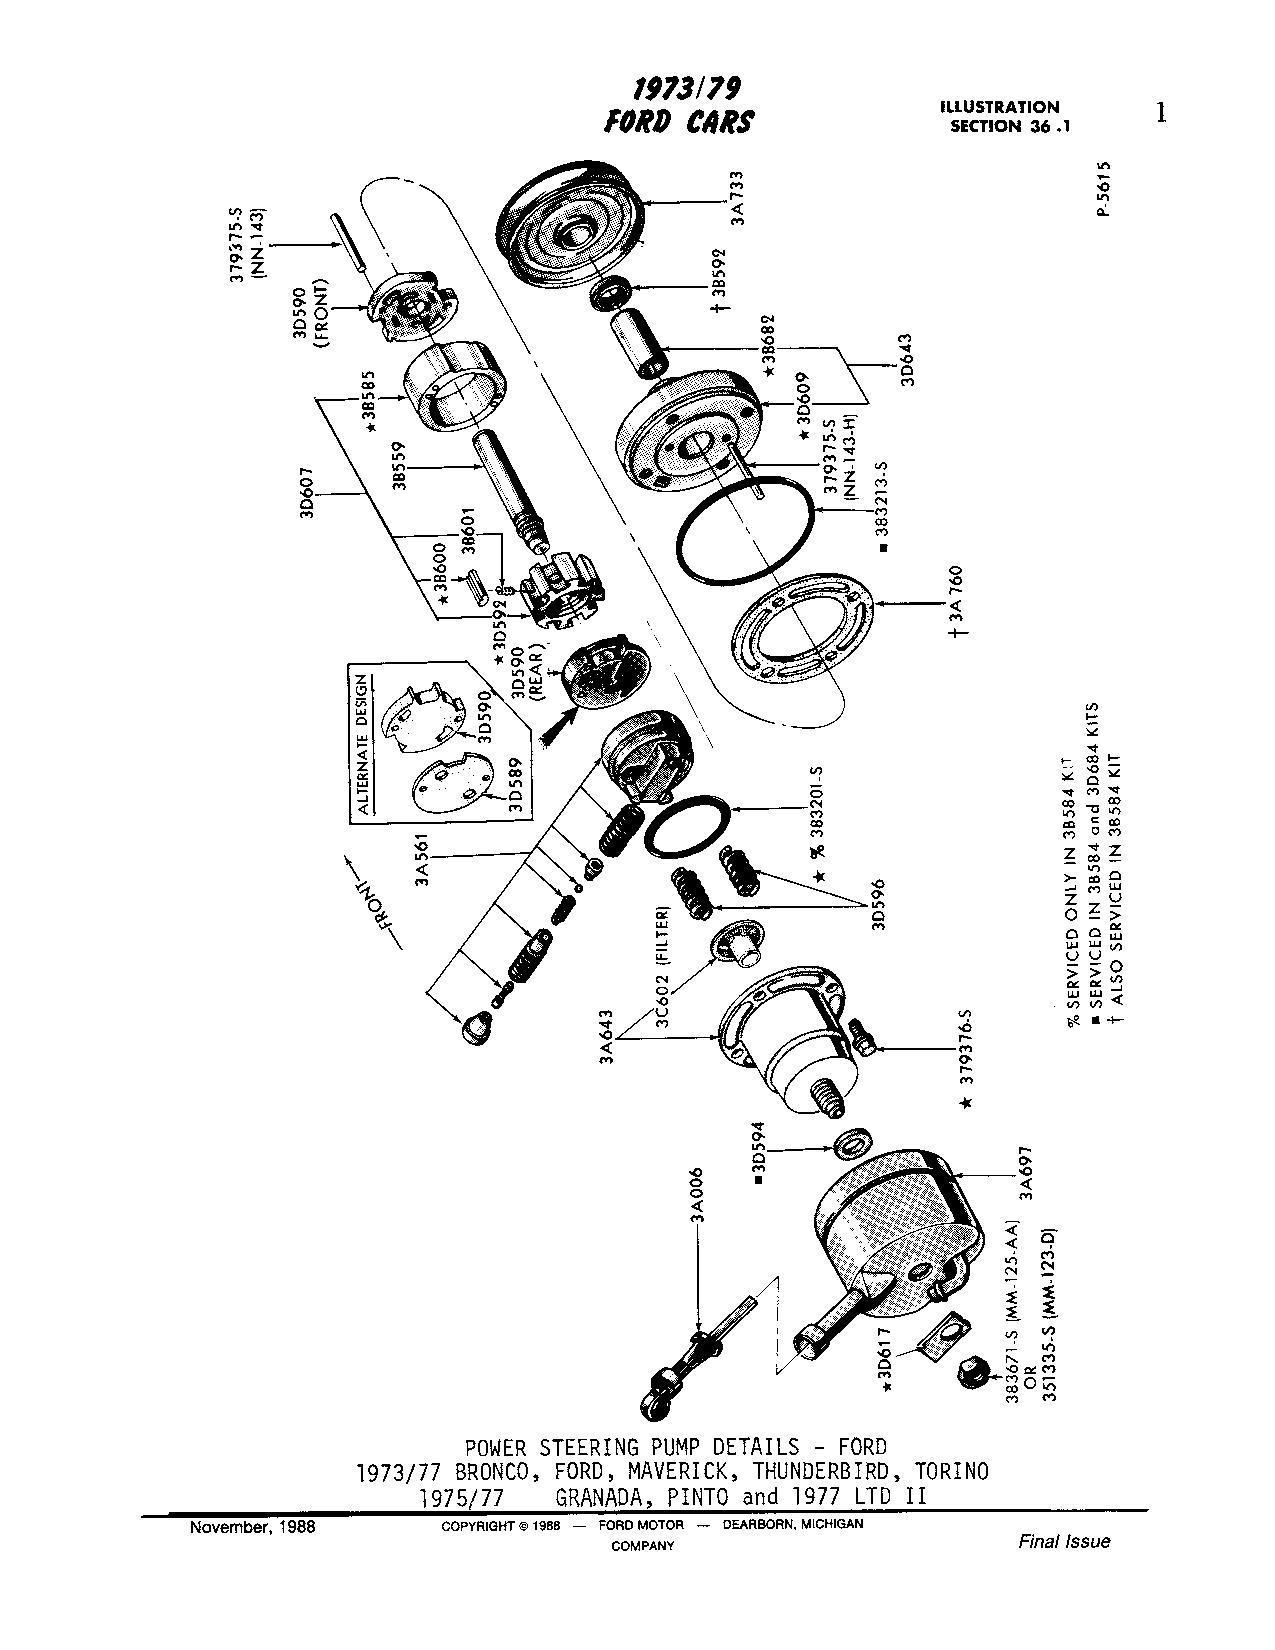 1977 cj7 engine diagram wiring diagram database Custom 1977 CJ 7 1977 ltd wiring diagram database car dealer 1976 cj7 1977 cj7 engine diagram